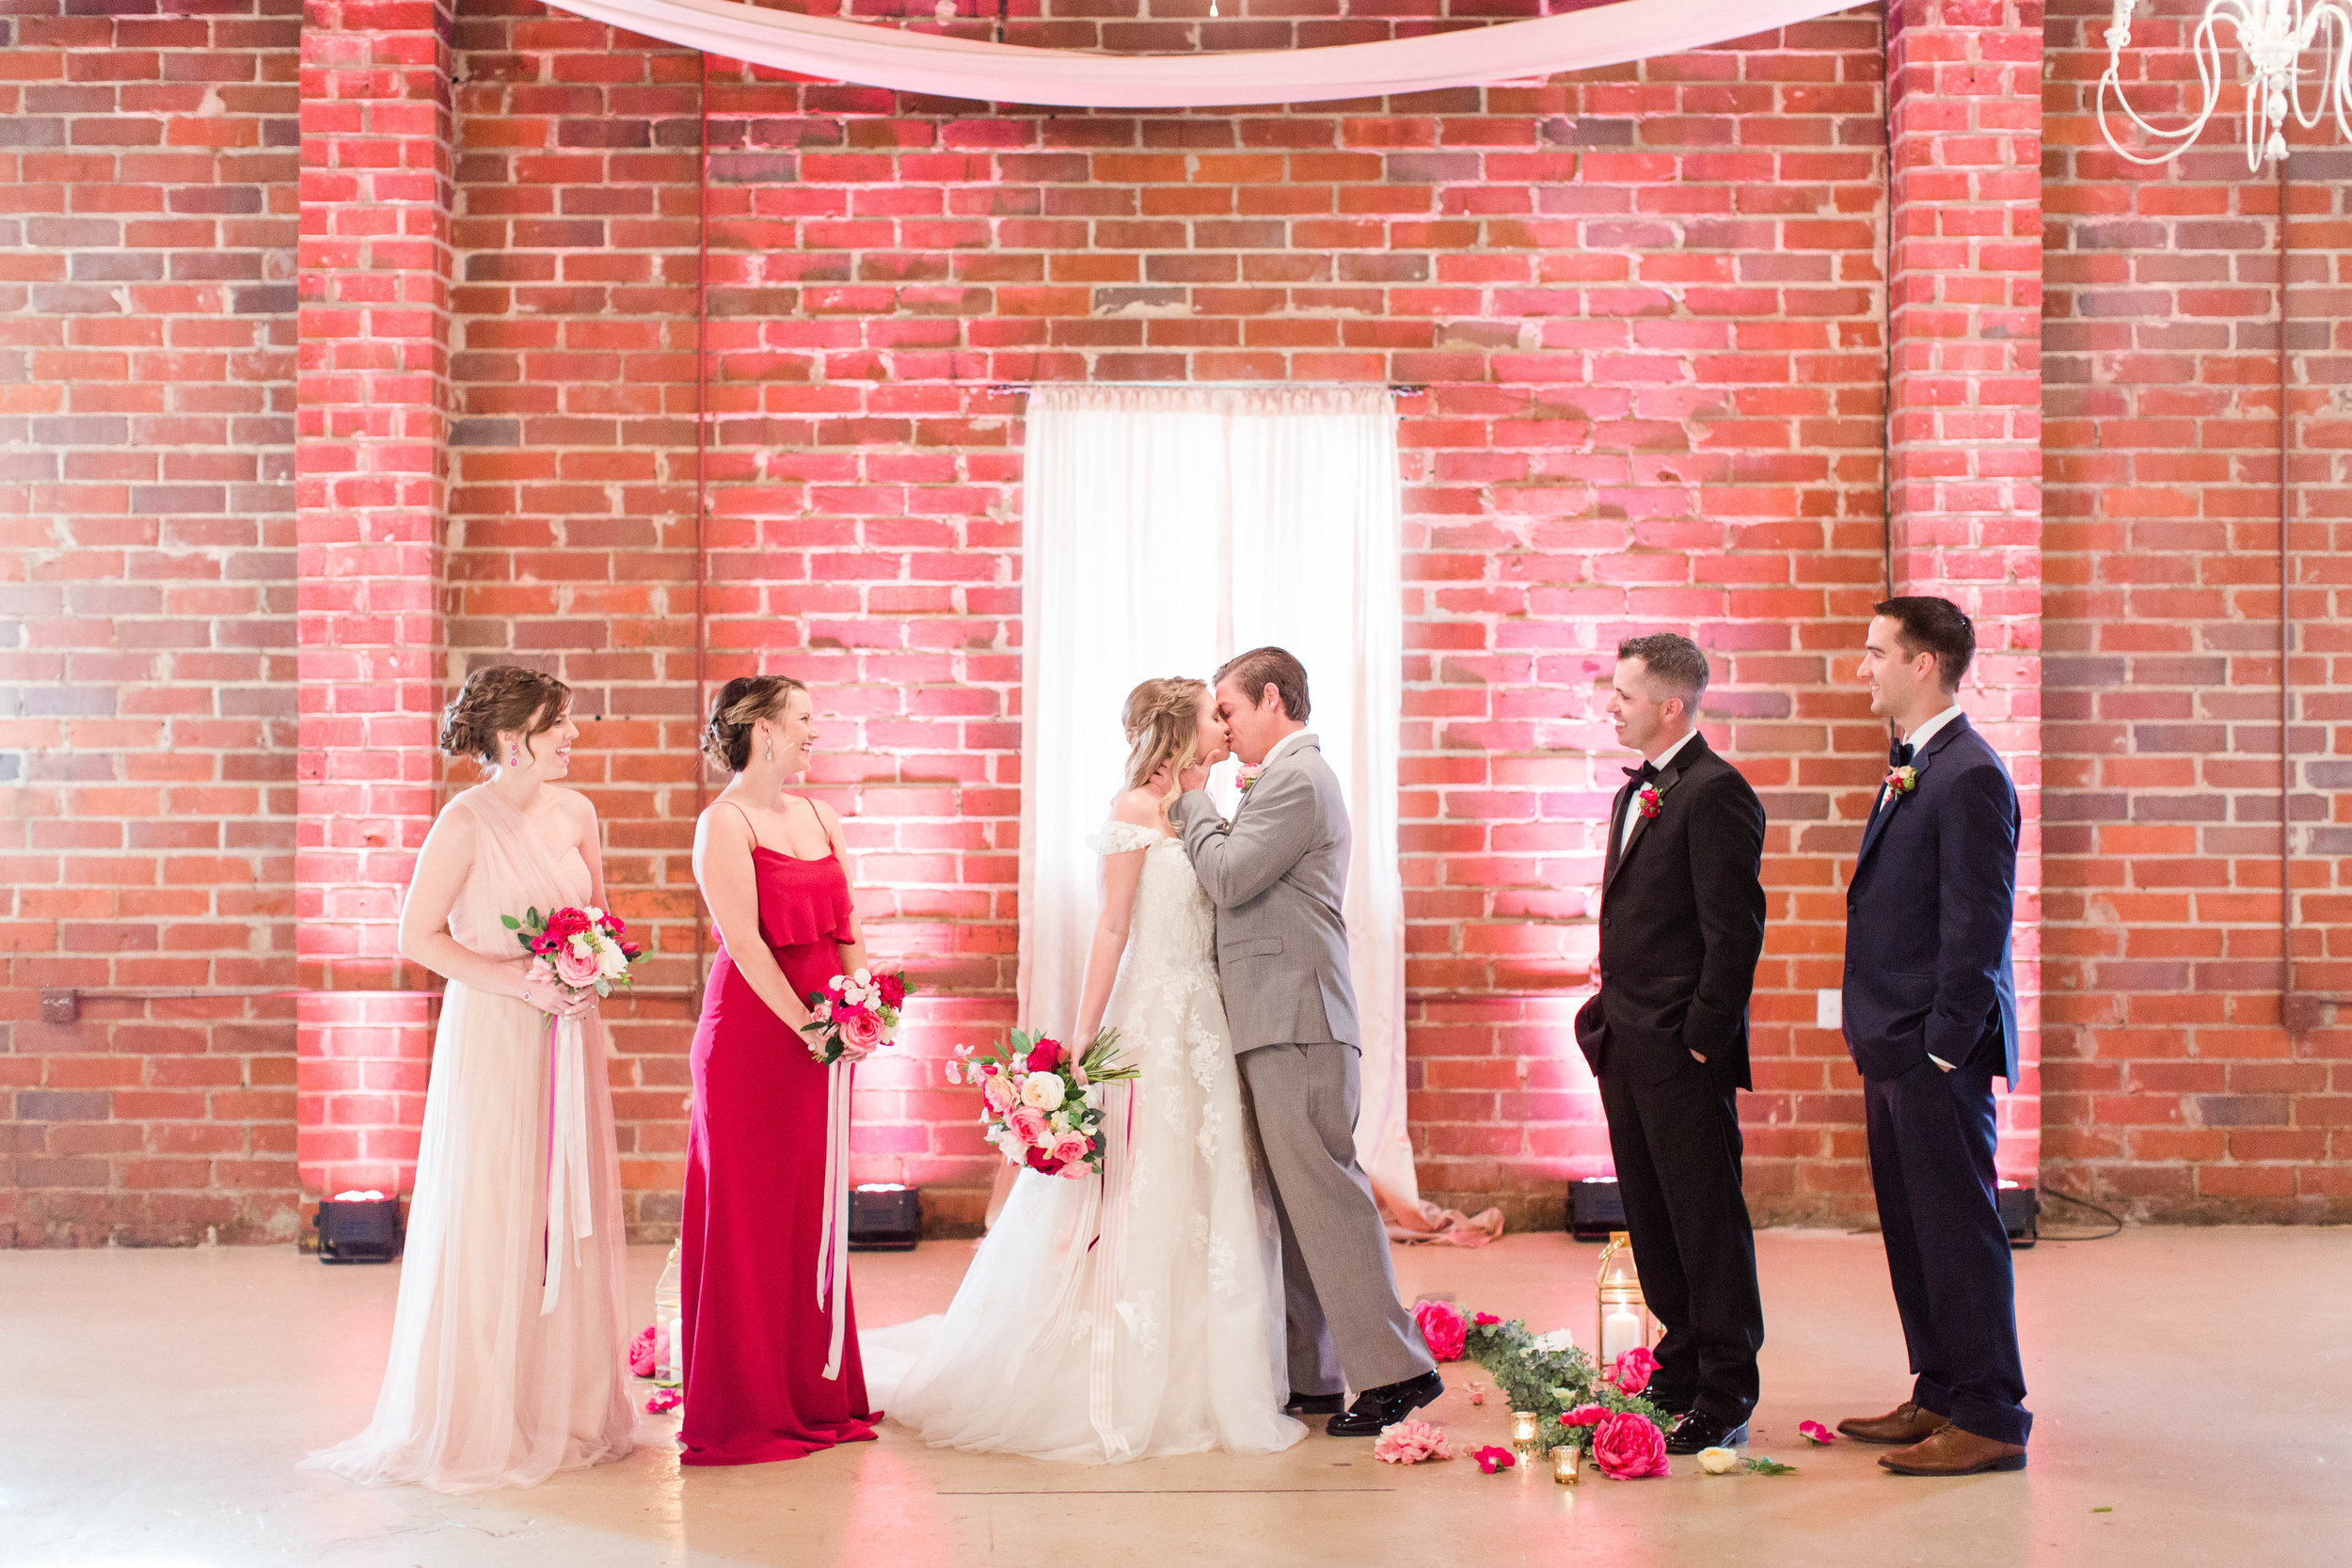 afloral-fake-flower-wedding-ivory-and-beau-bridal-boutique-maggie-sottero-saffron-the-hall-on-vine-wedding-statesboro-wedding-savannah-wedding-kristian-designs-rachel-strickland-photography-savannah-bridal-southern-bride-savannah-bride-10.jpg